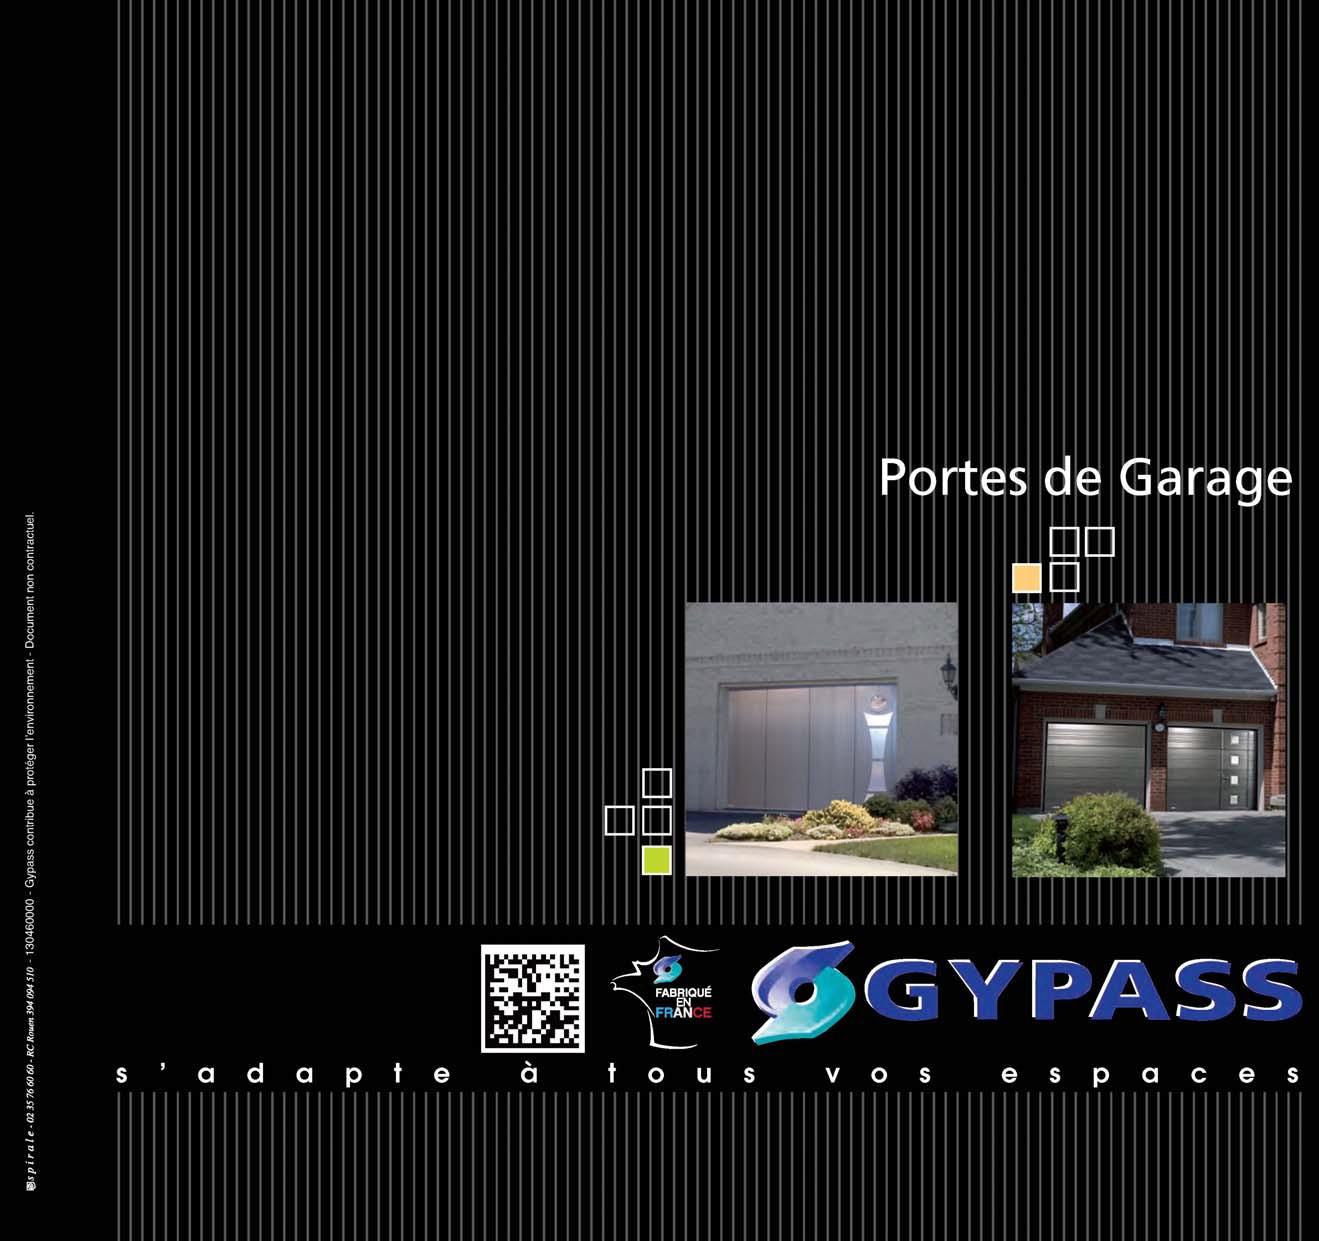 Catalogue Gypass Porte De Garage Sectionnelle Nicolas Gand Sarl